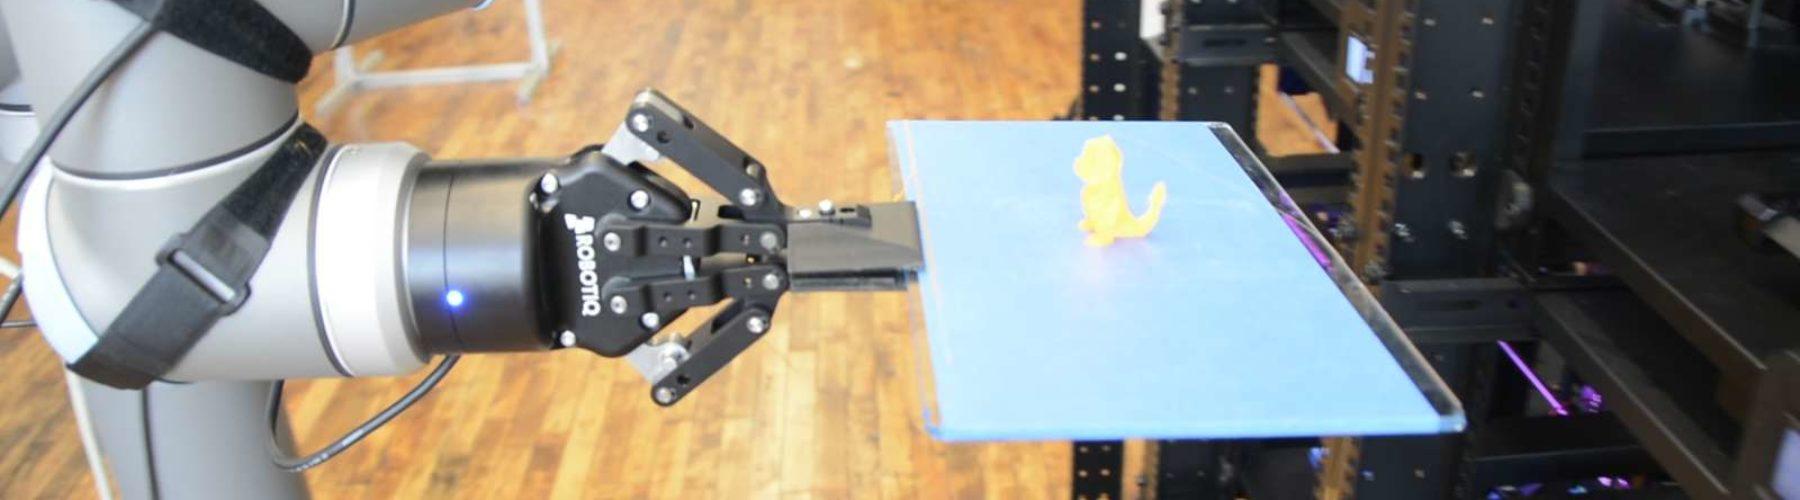 Case Study - Universal Robots na Impressão 3D